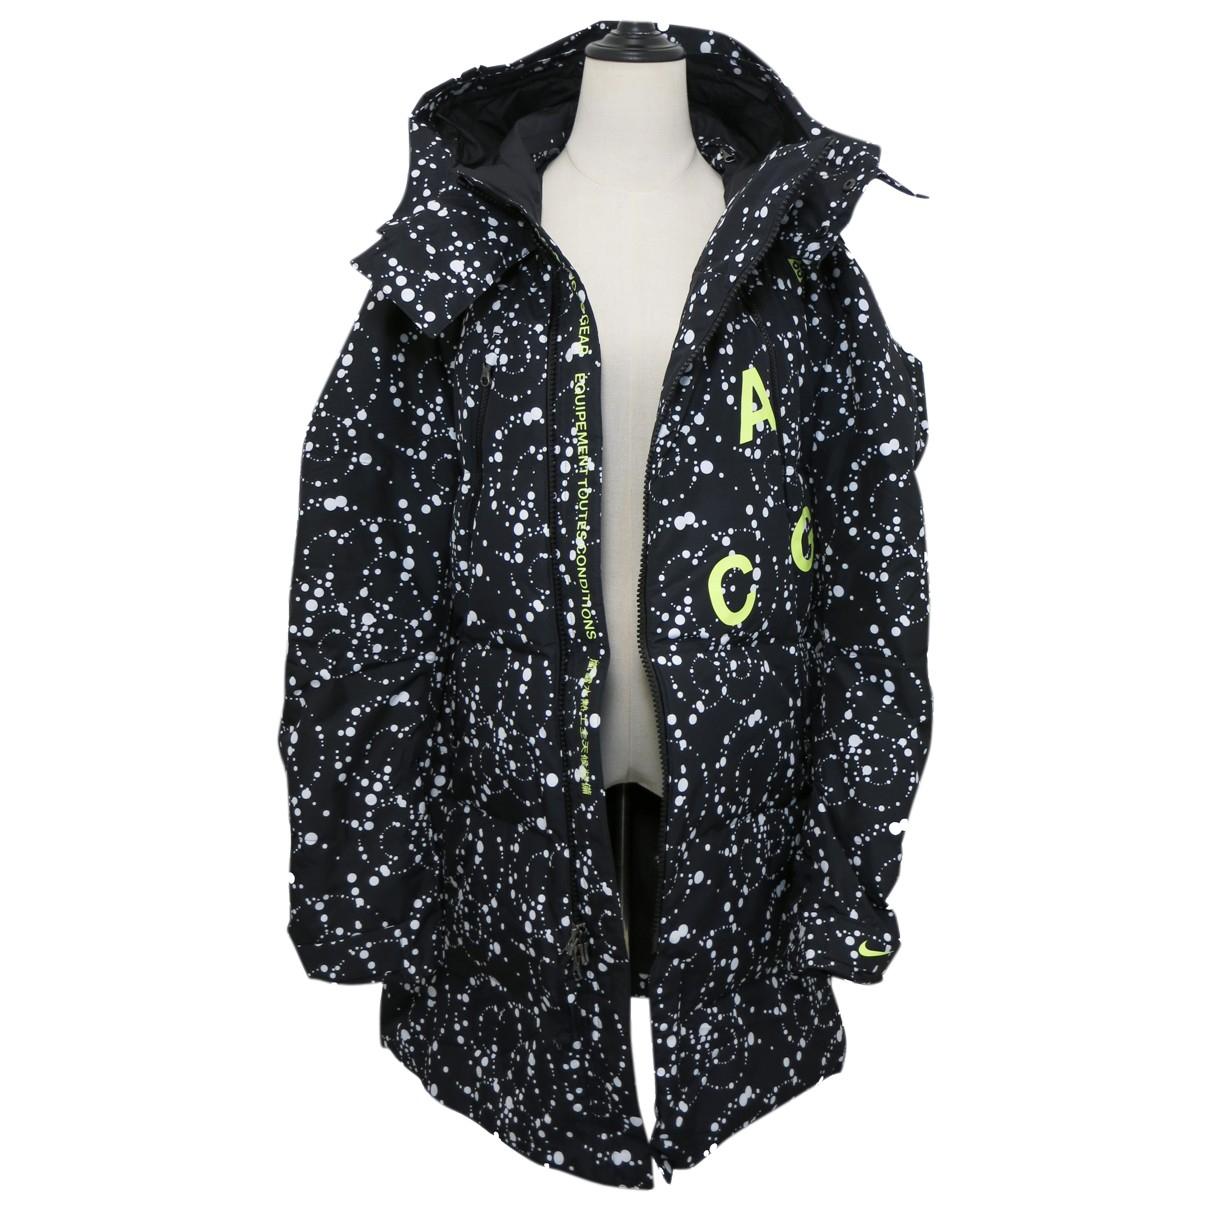 Nike Acg \N Jacke in  Schwarz Polyester